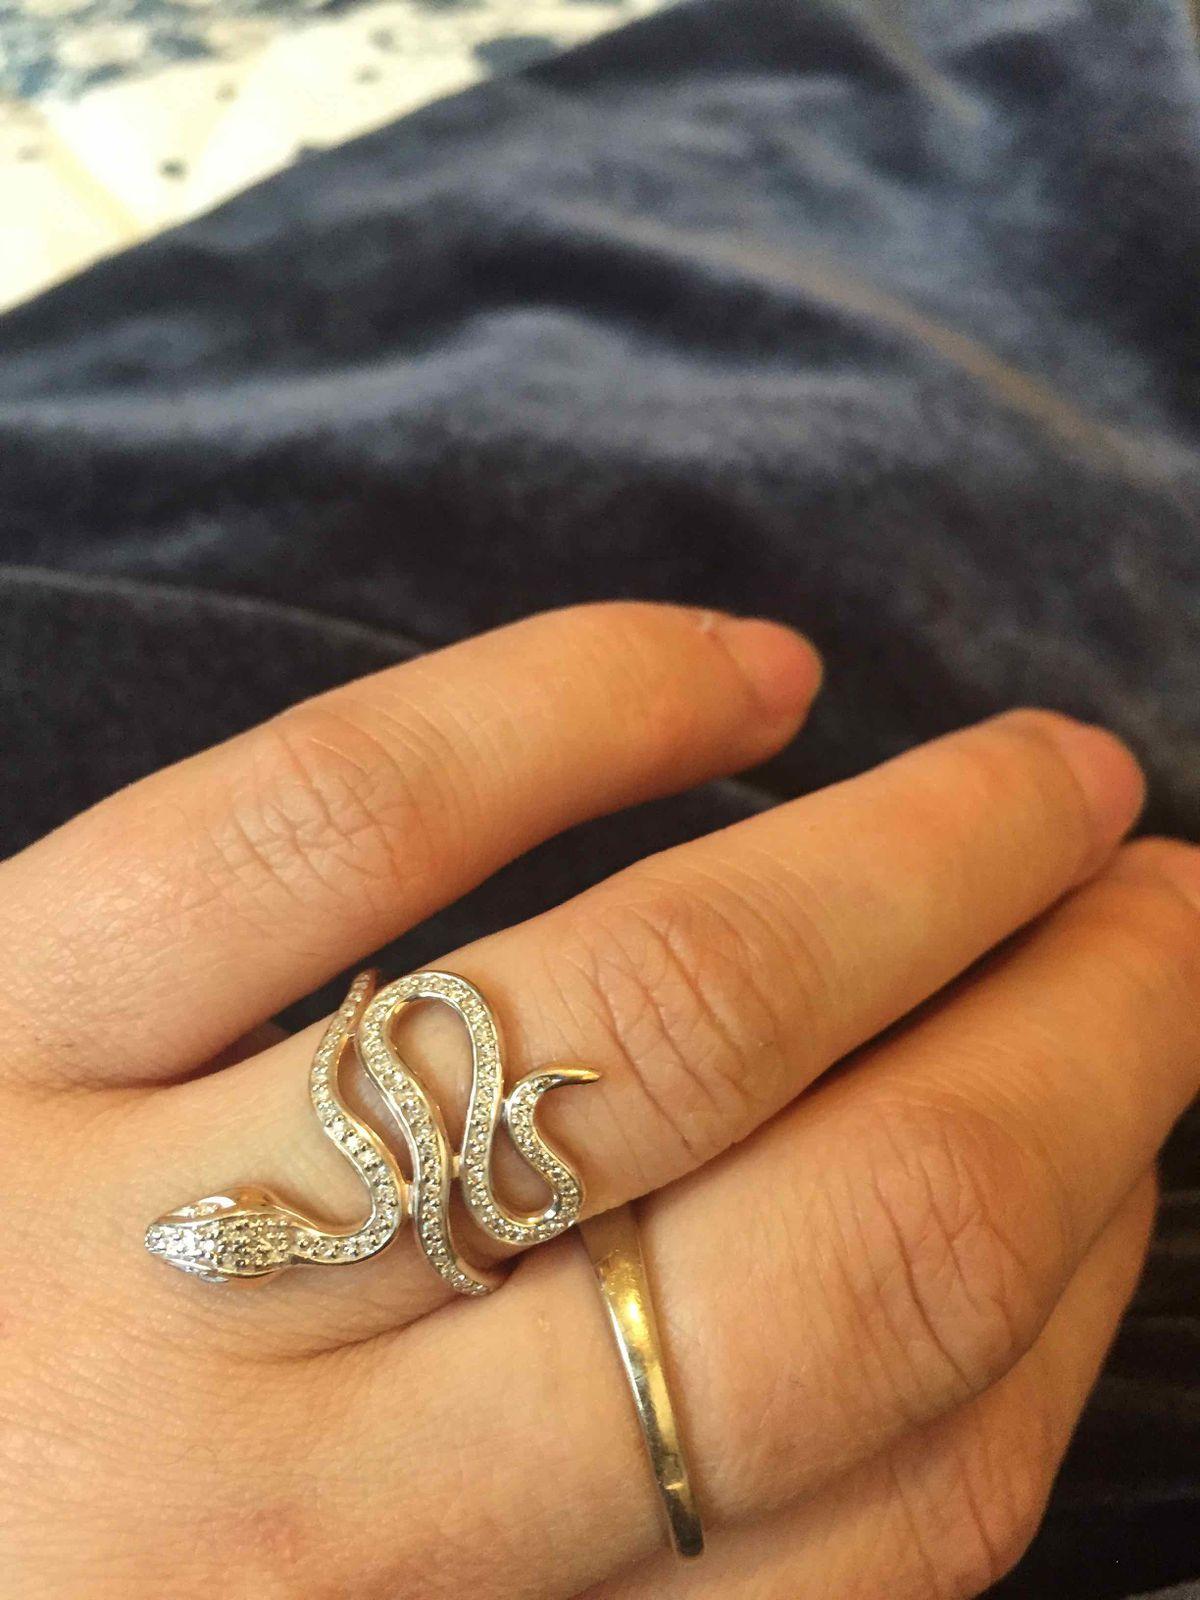 Змейка бриллиантовая